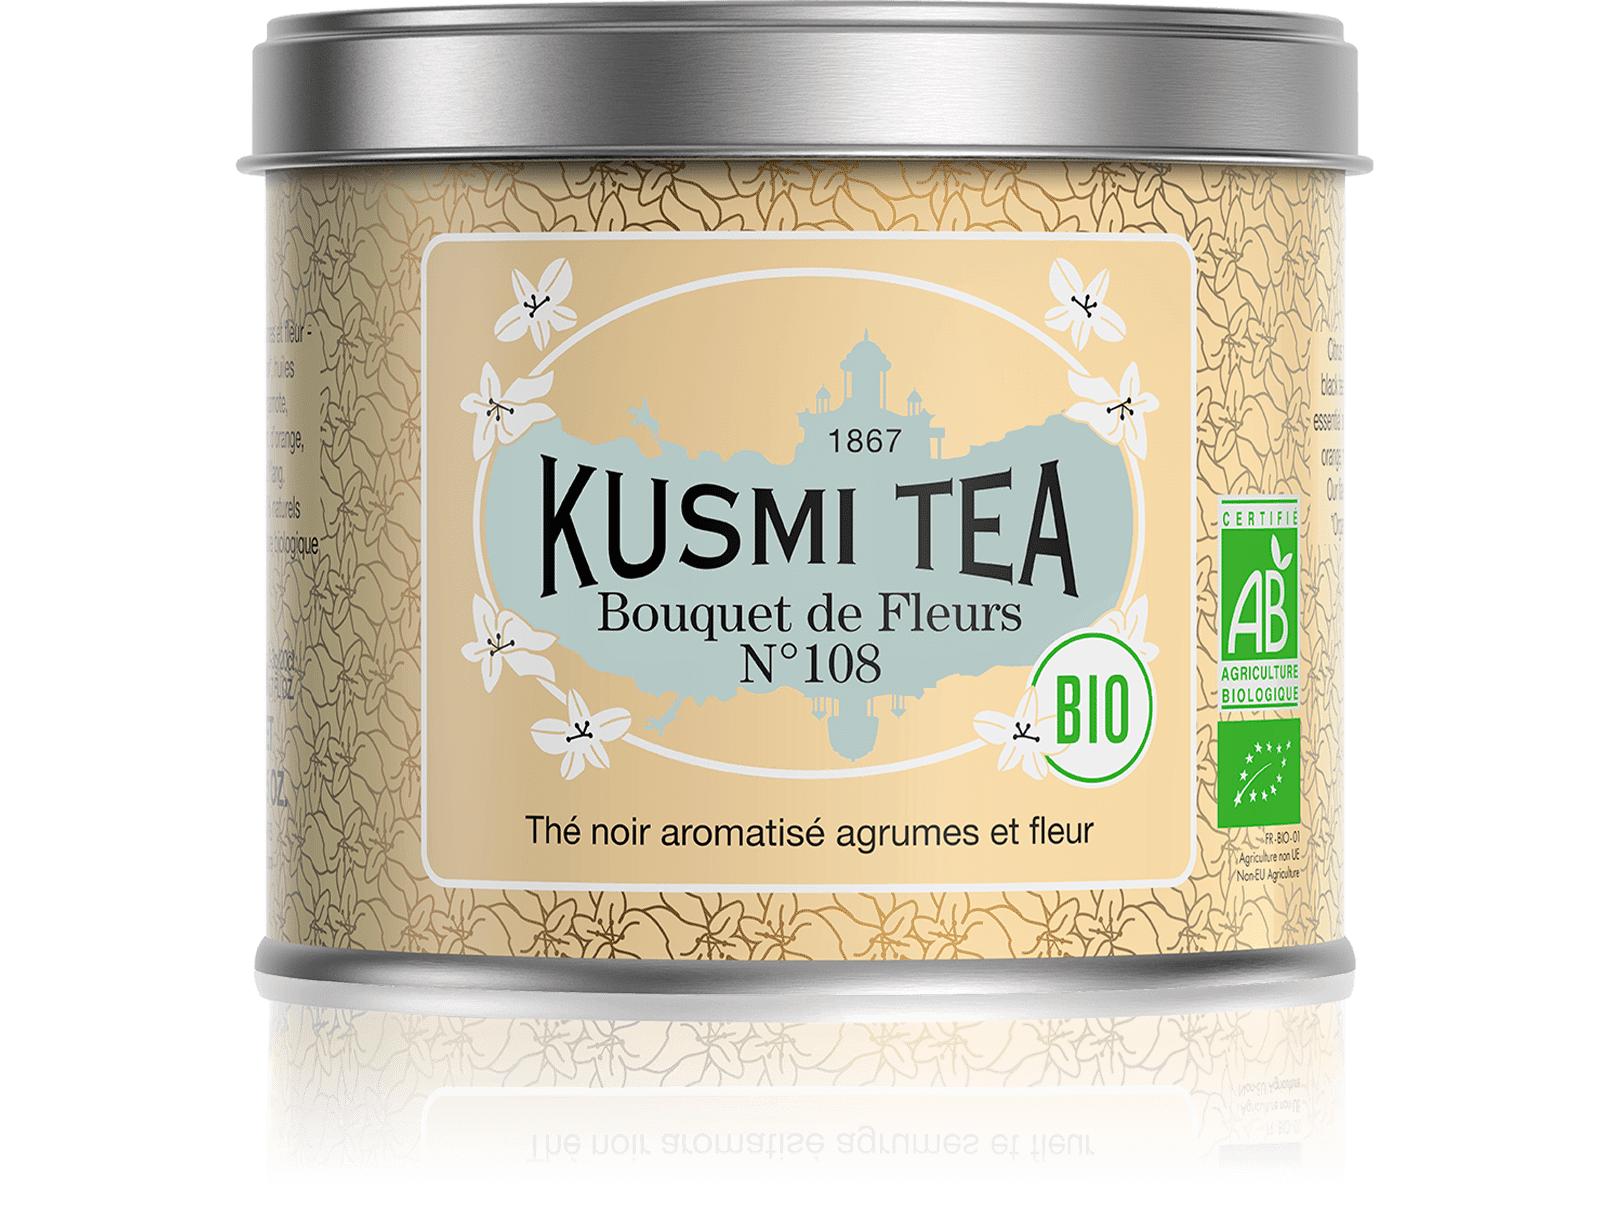 KUSMI TEA Bouquet de Fleurs N°108 bio  Thé noir  Kusmi Tea